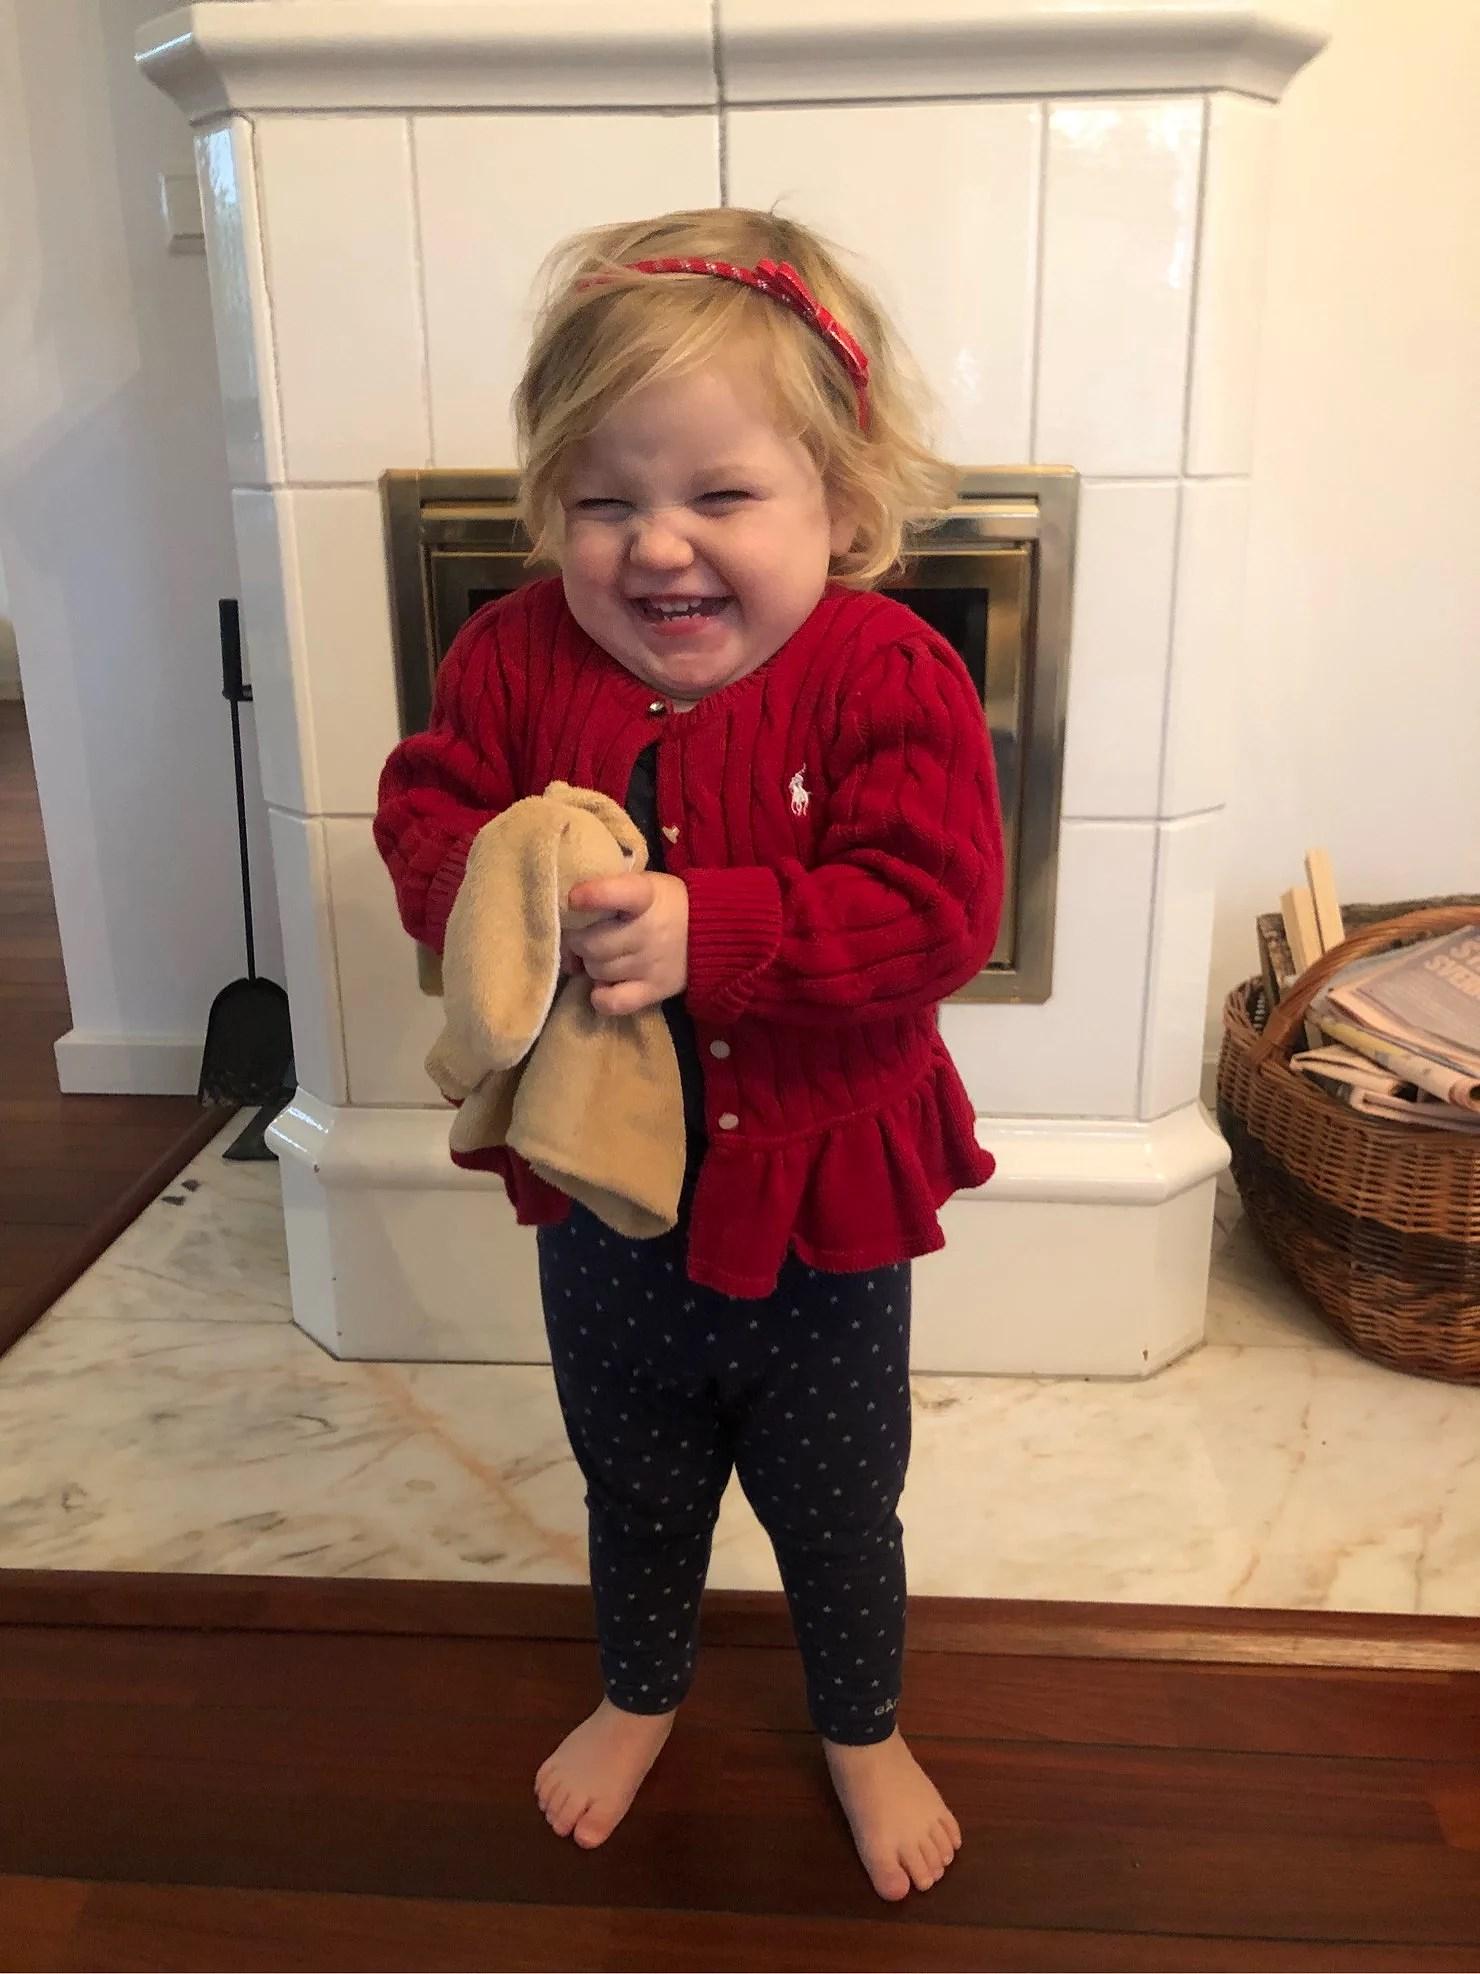 Får sista barnet gå mer på dagis?